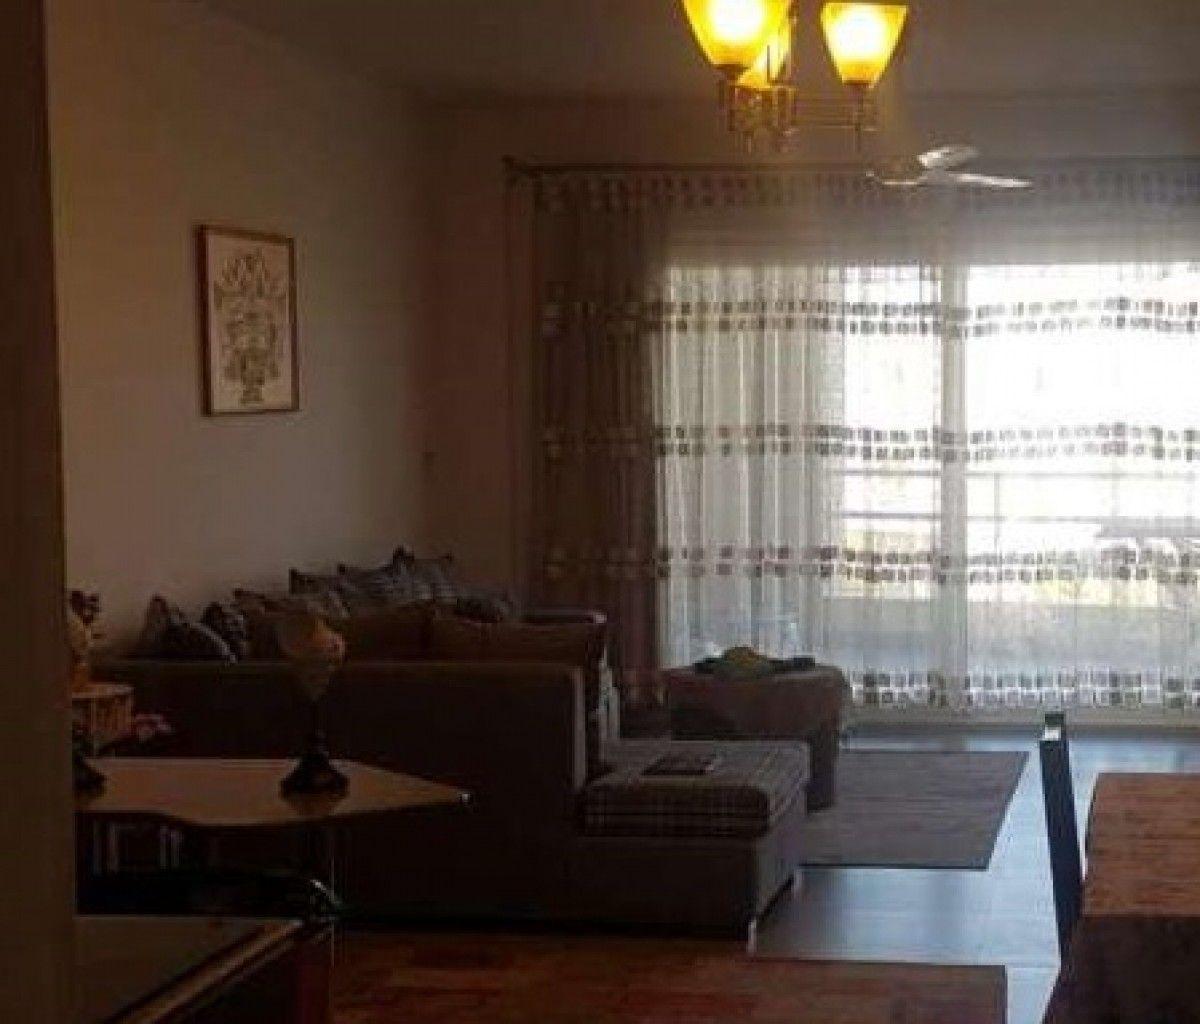 Amwaj chalet for rent 2800 EGP per night امواج الساحل الشمالى ايجار